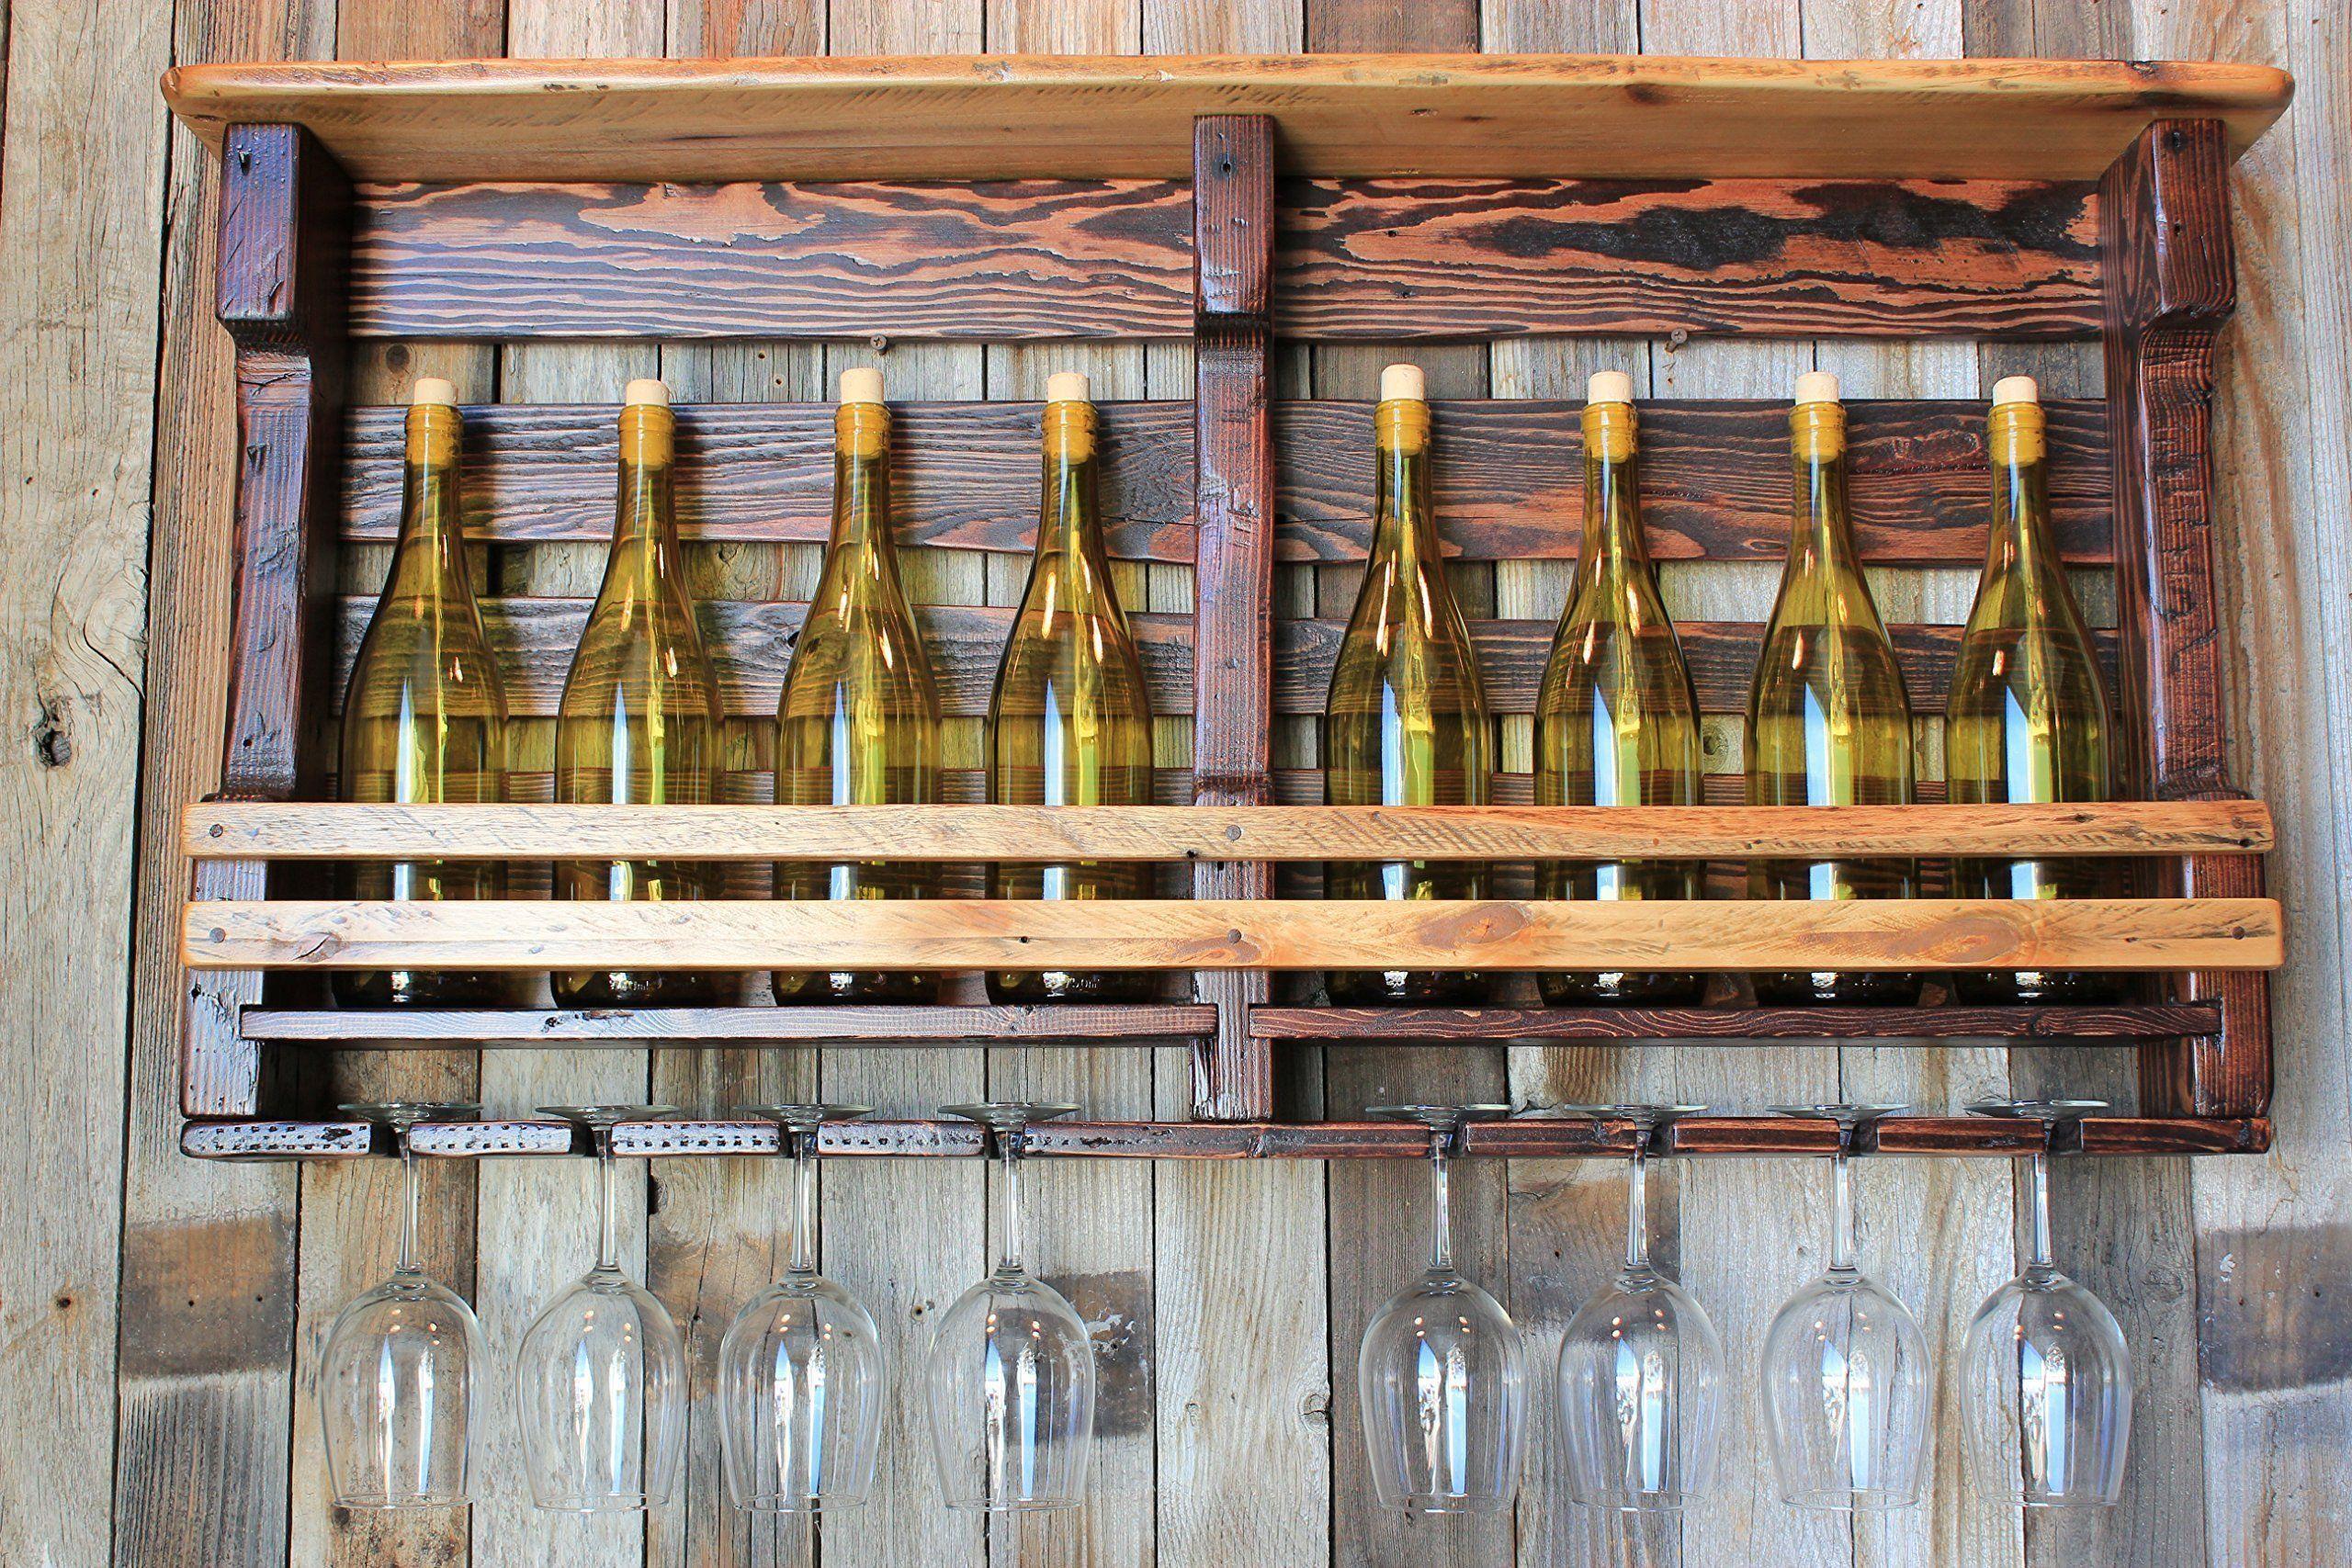 Rundown rustics wine rack storage shelf organizer display décor